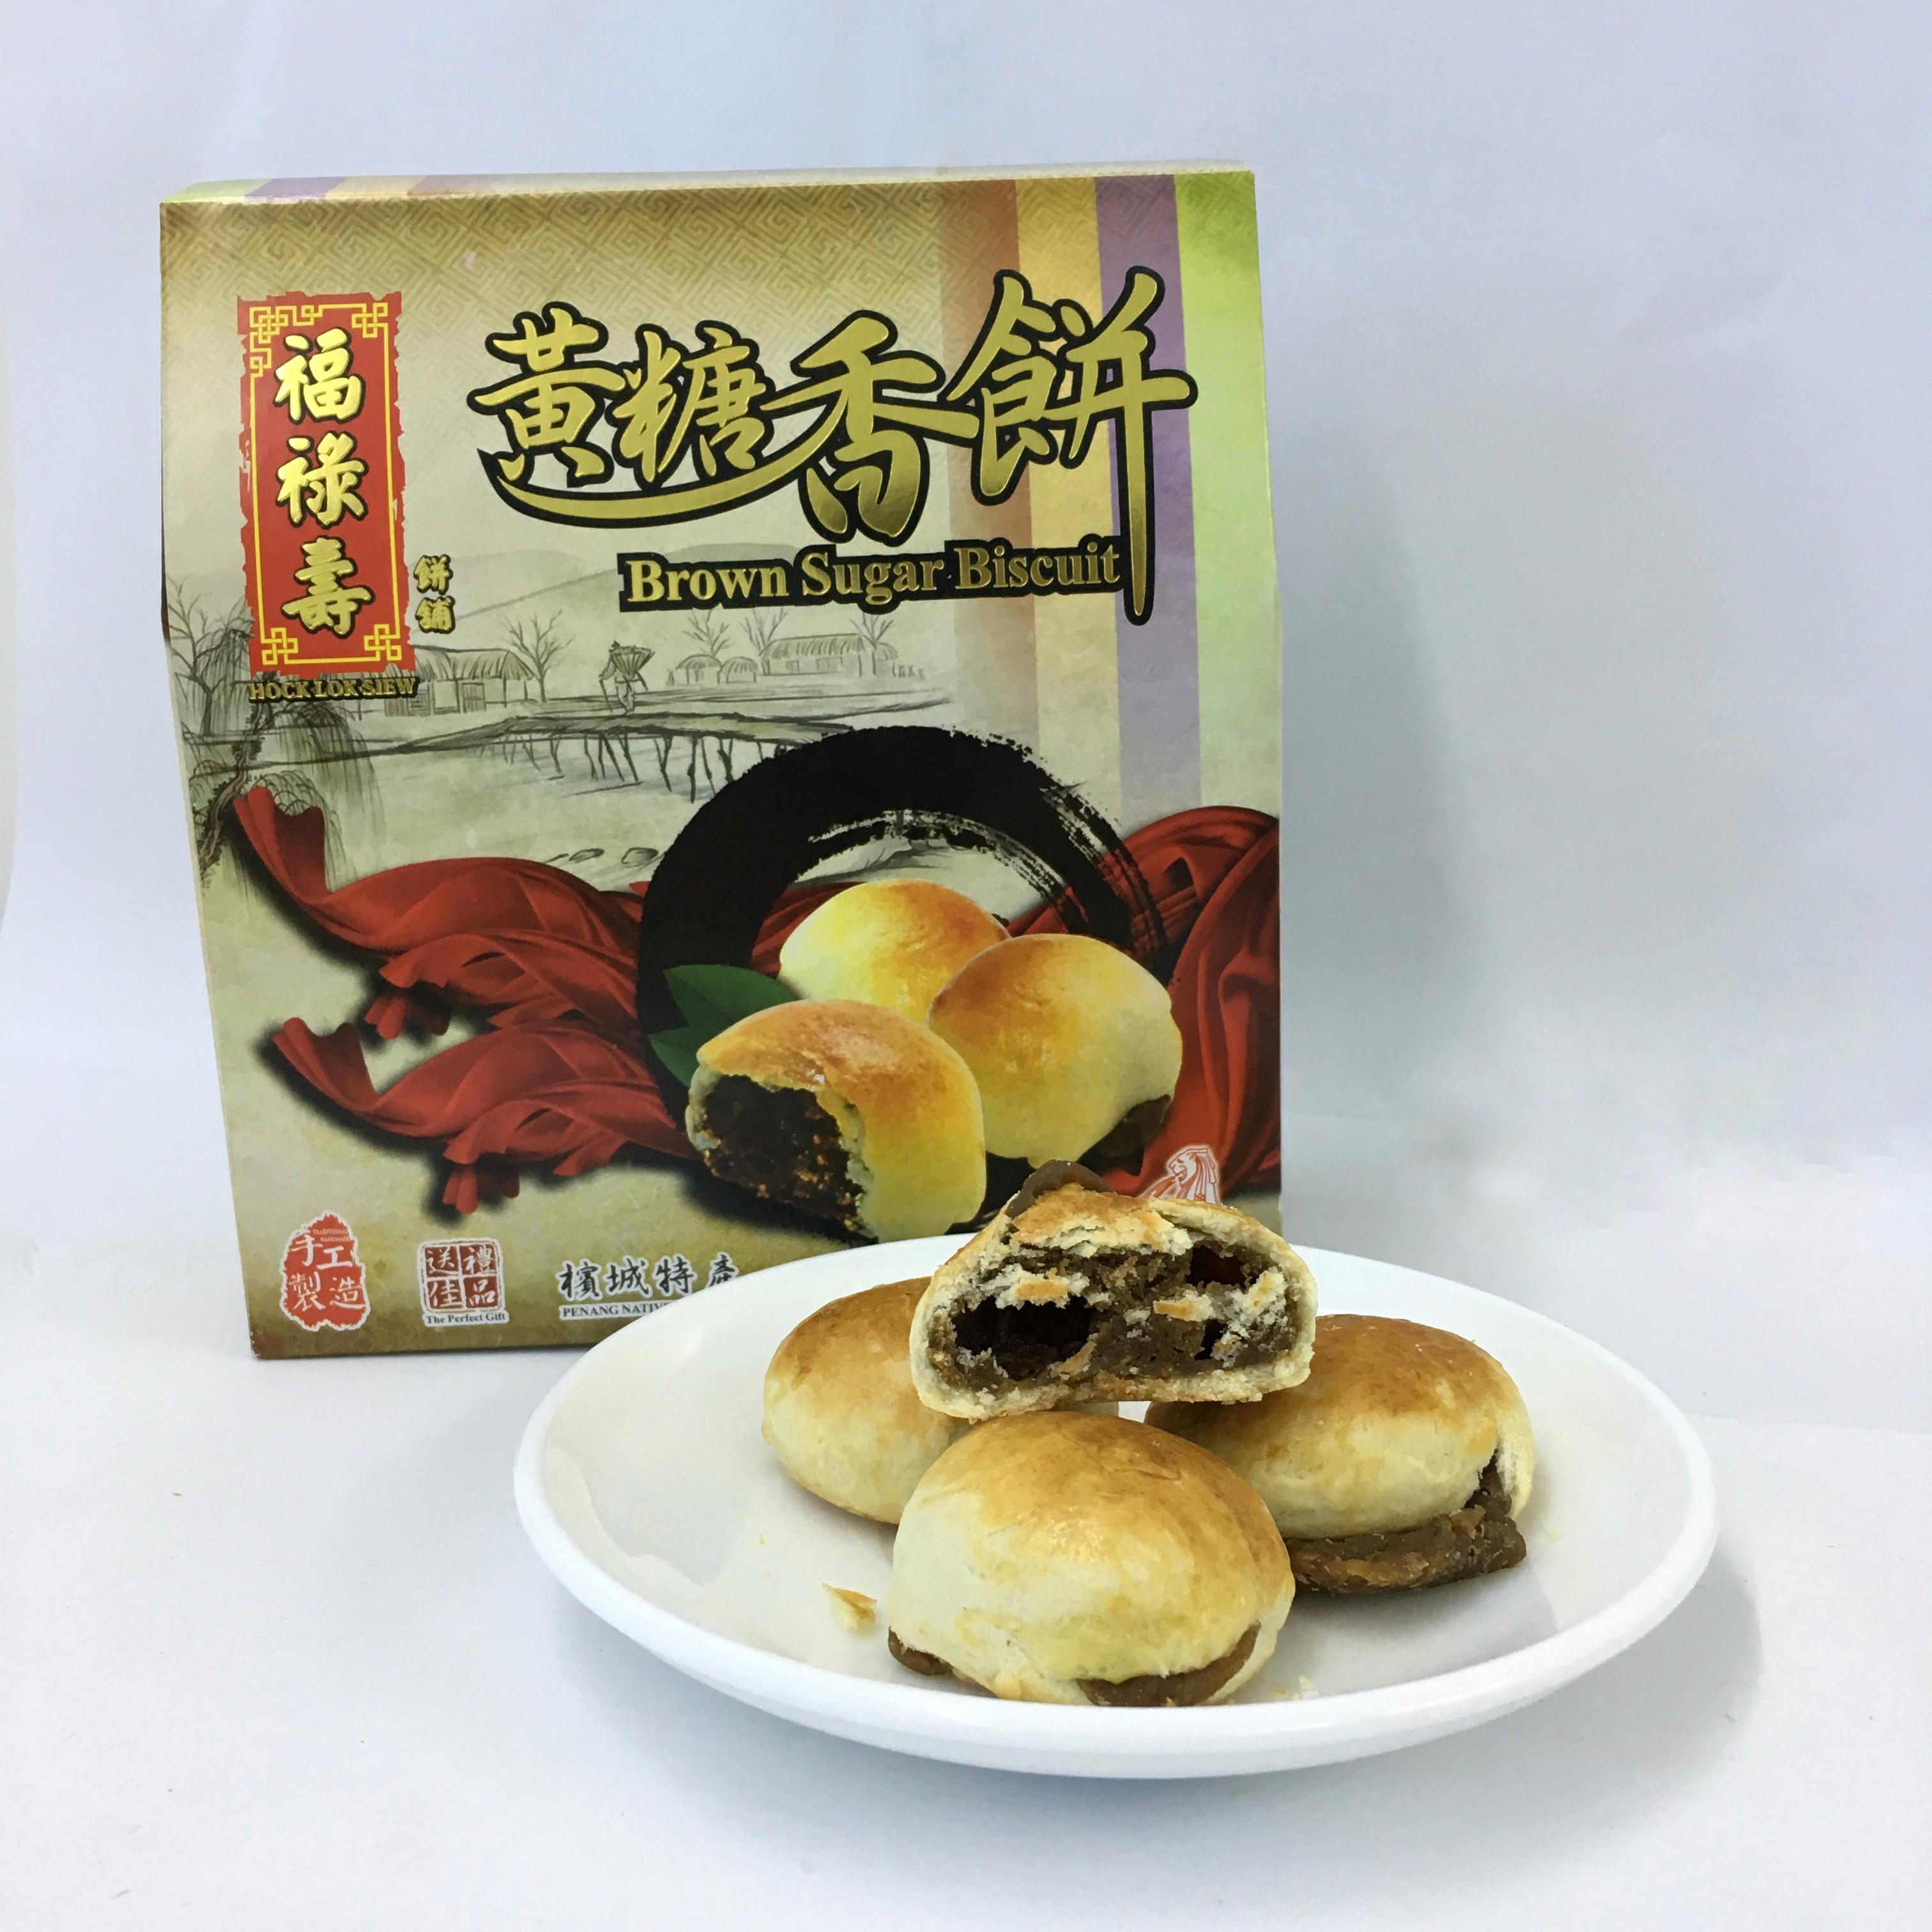 Brown Sugar Biscuit 黄糖香饼